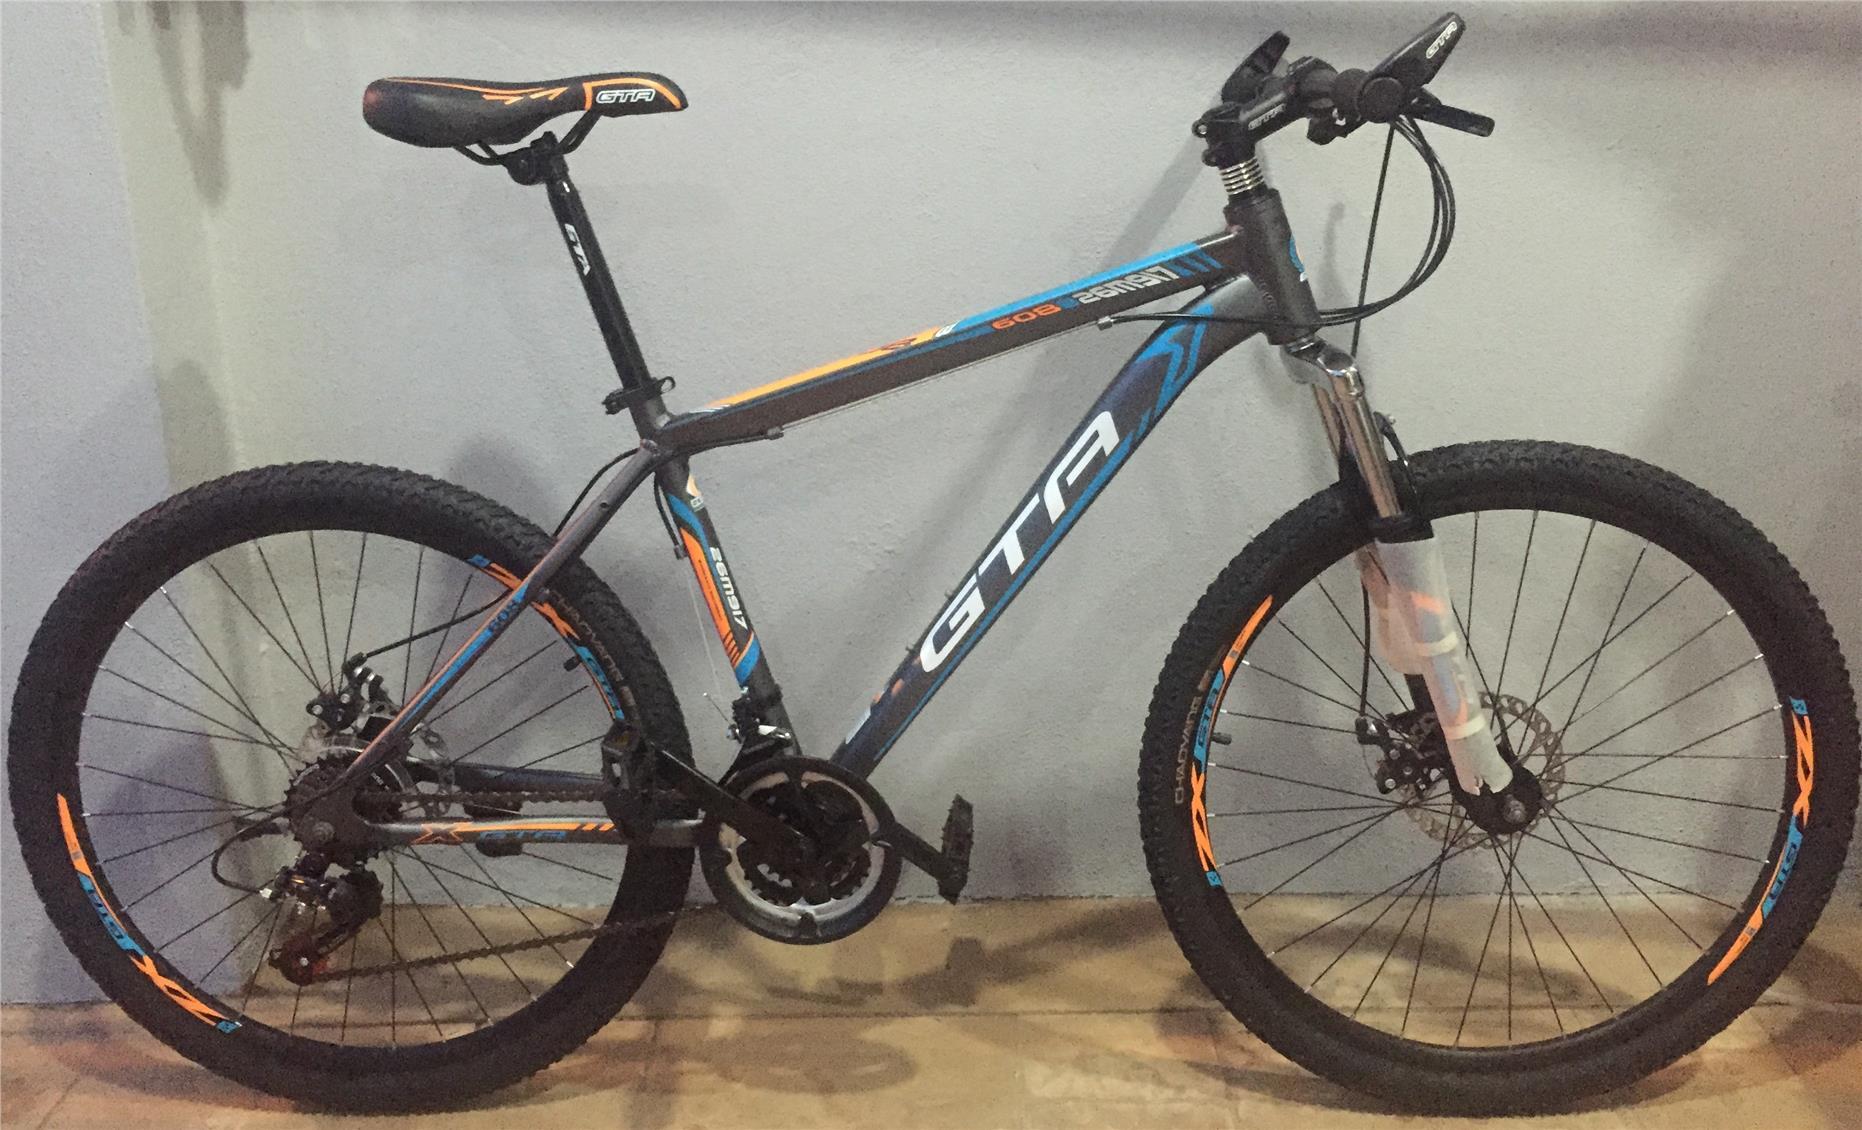 Gta 21 Speed Shimano 26er Bike Bicy End 10 21 2016 5 15 Pm